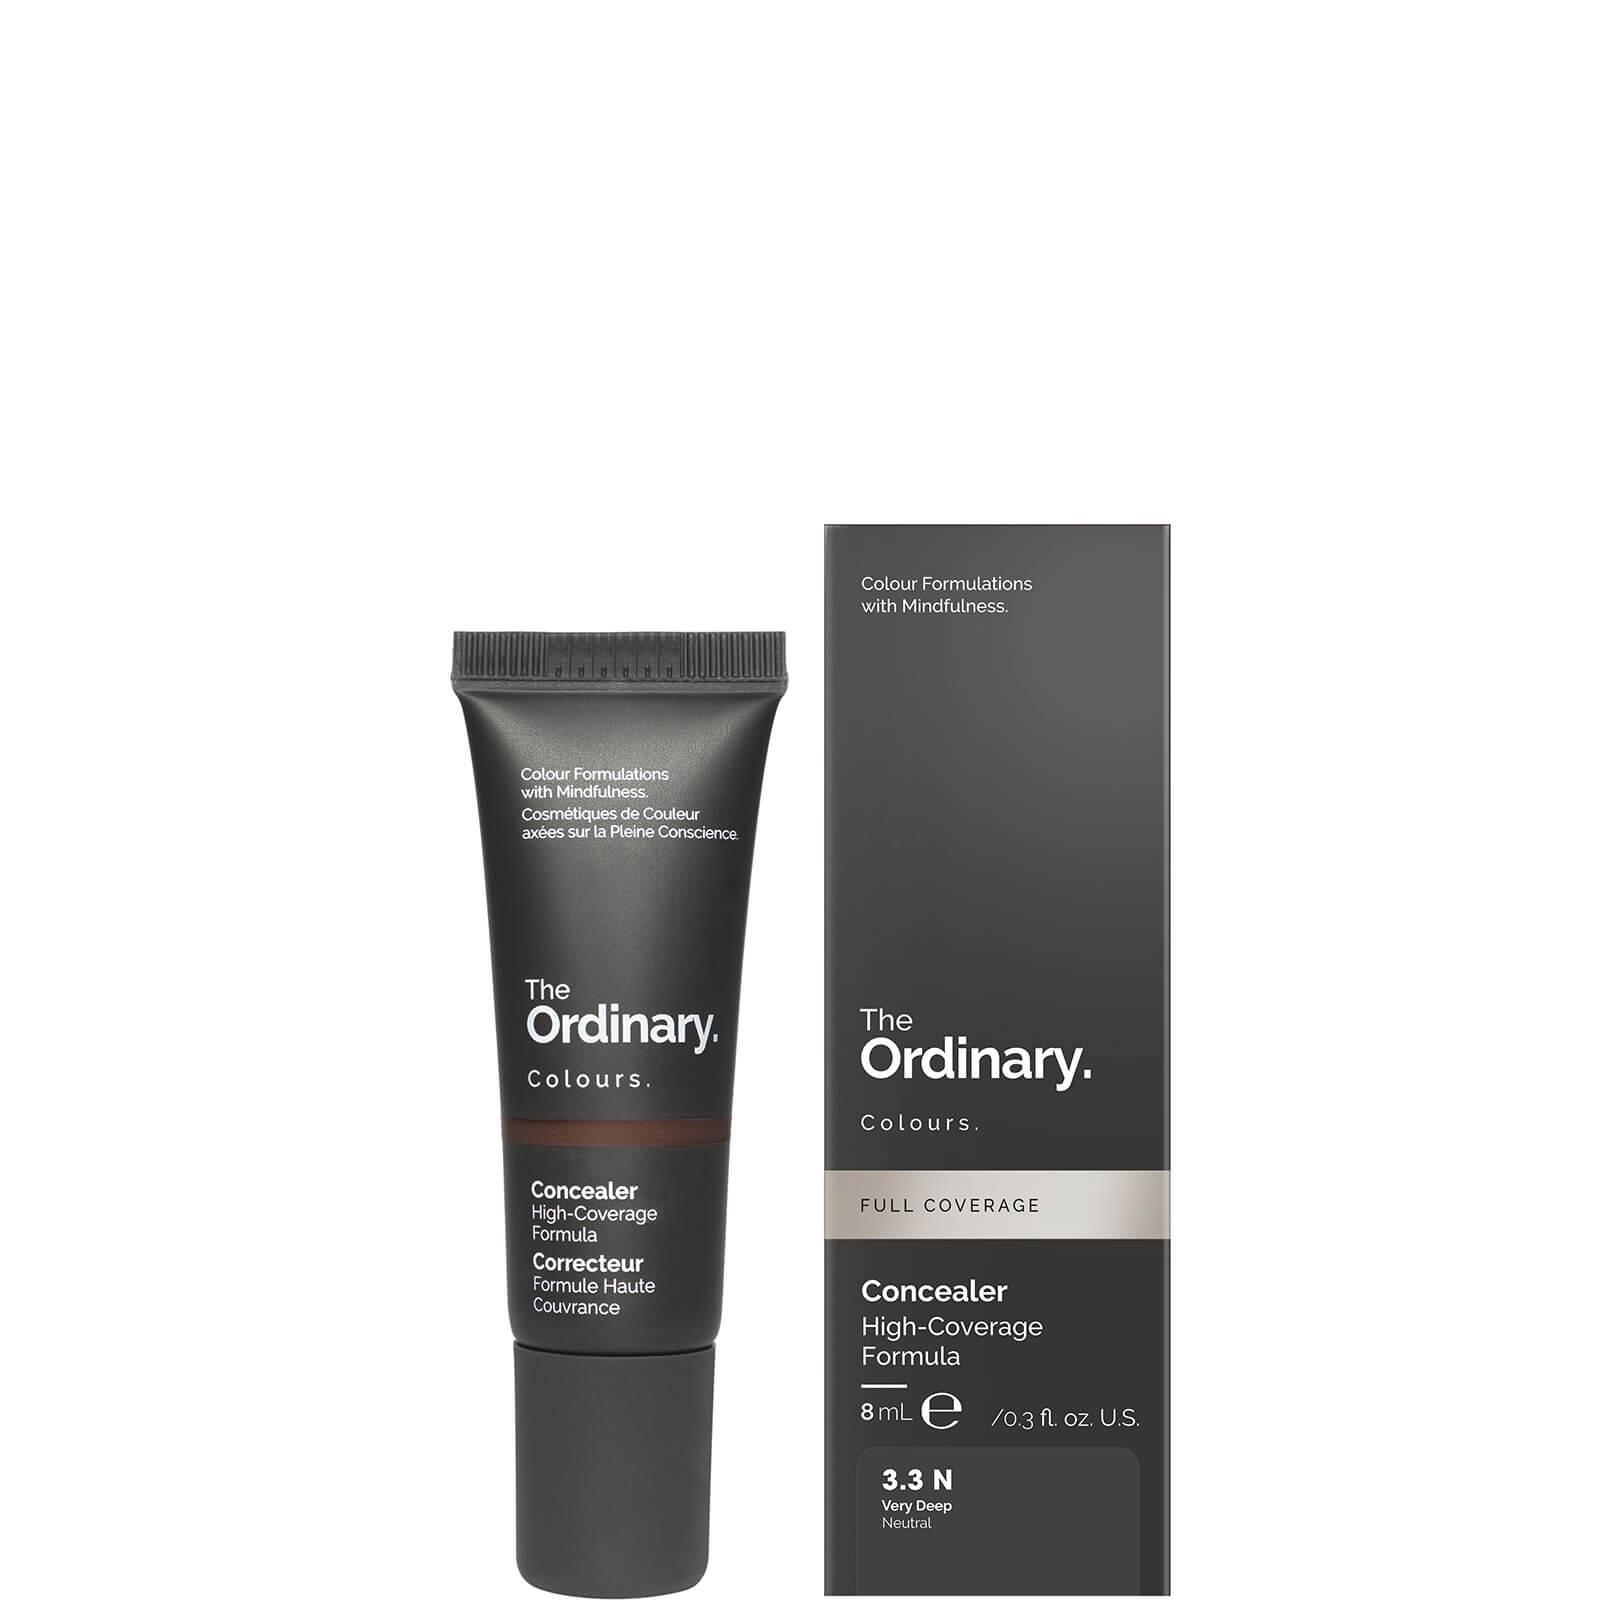 Купить The Ordinary Concealer 8ml (Various Shades) - 4.1 N